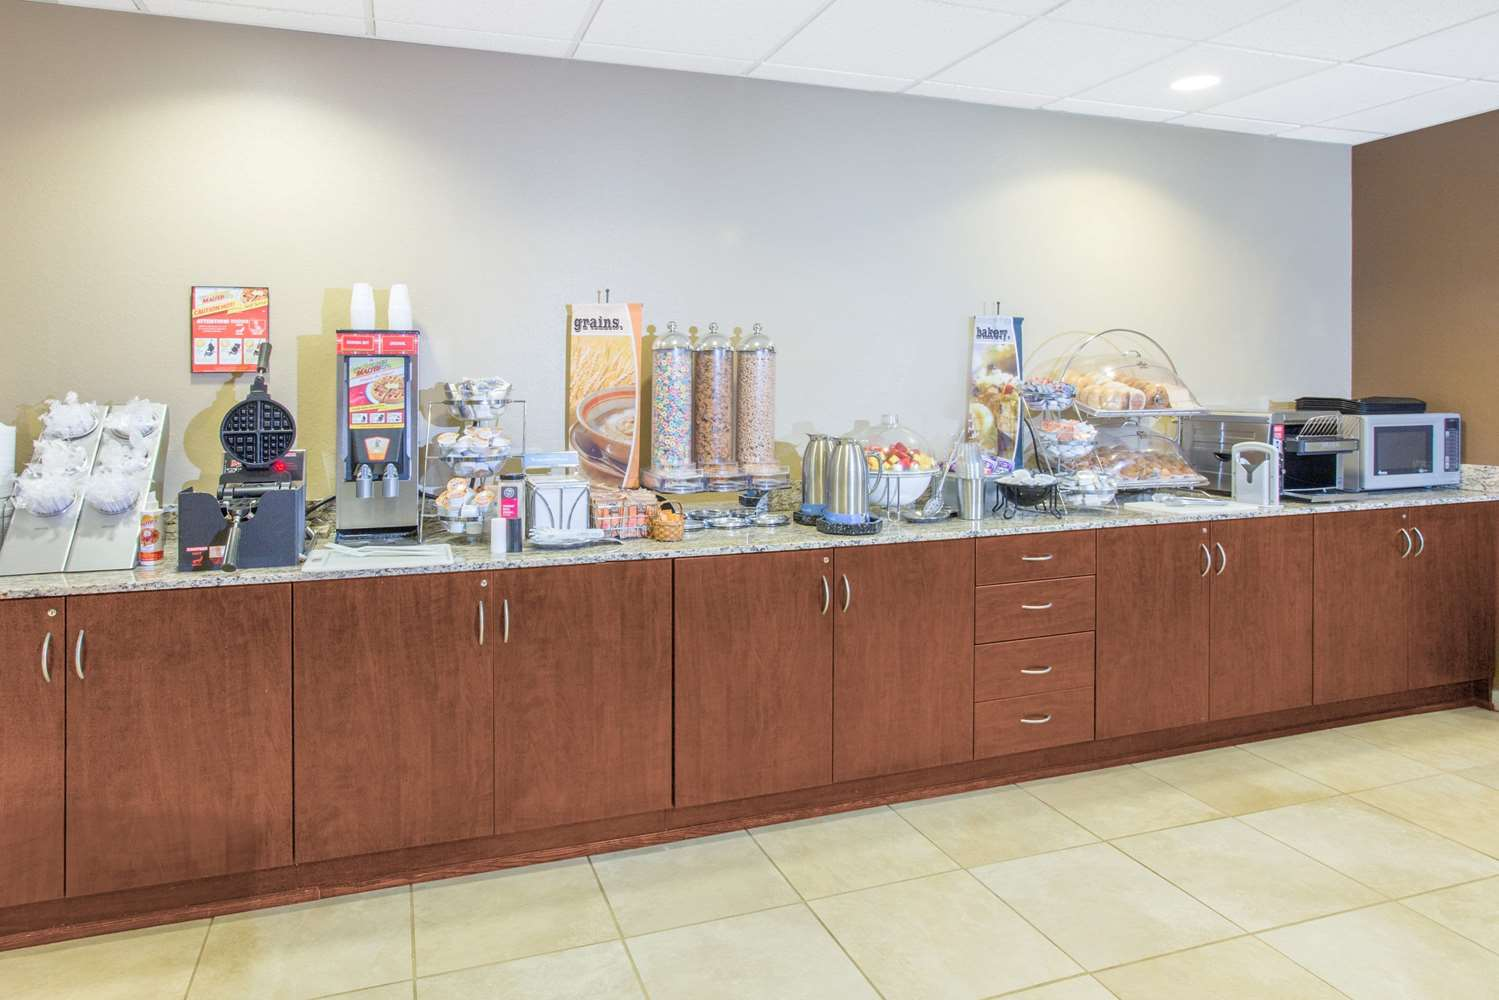 proam - Microtel Inn & Suites by Wyndham Mansfield